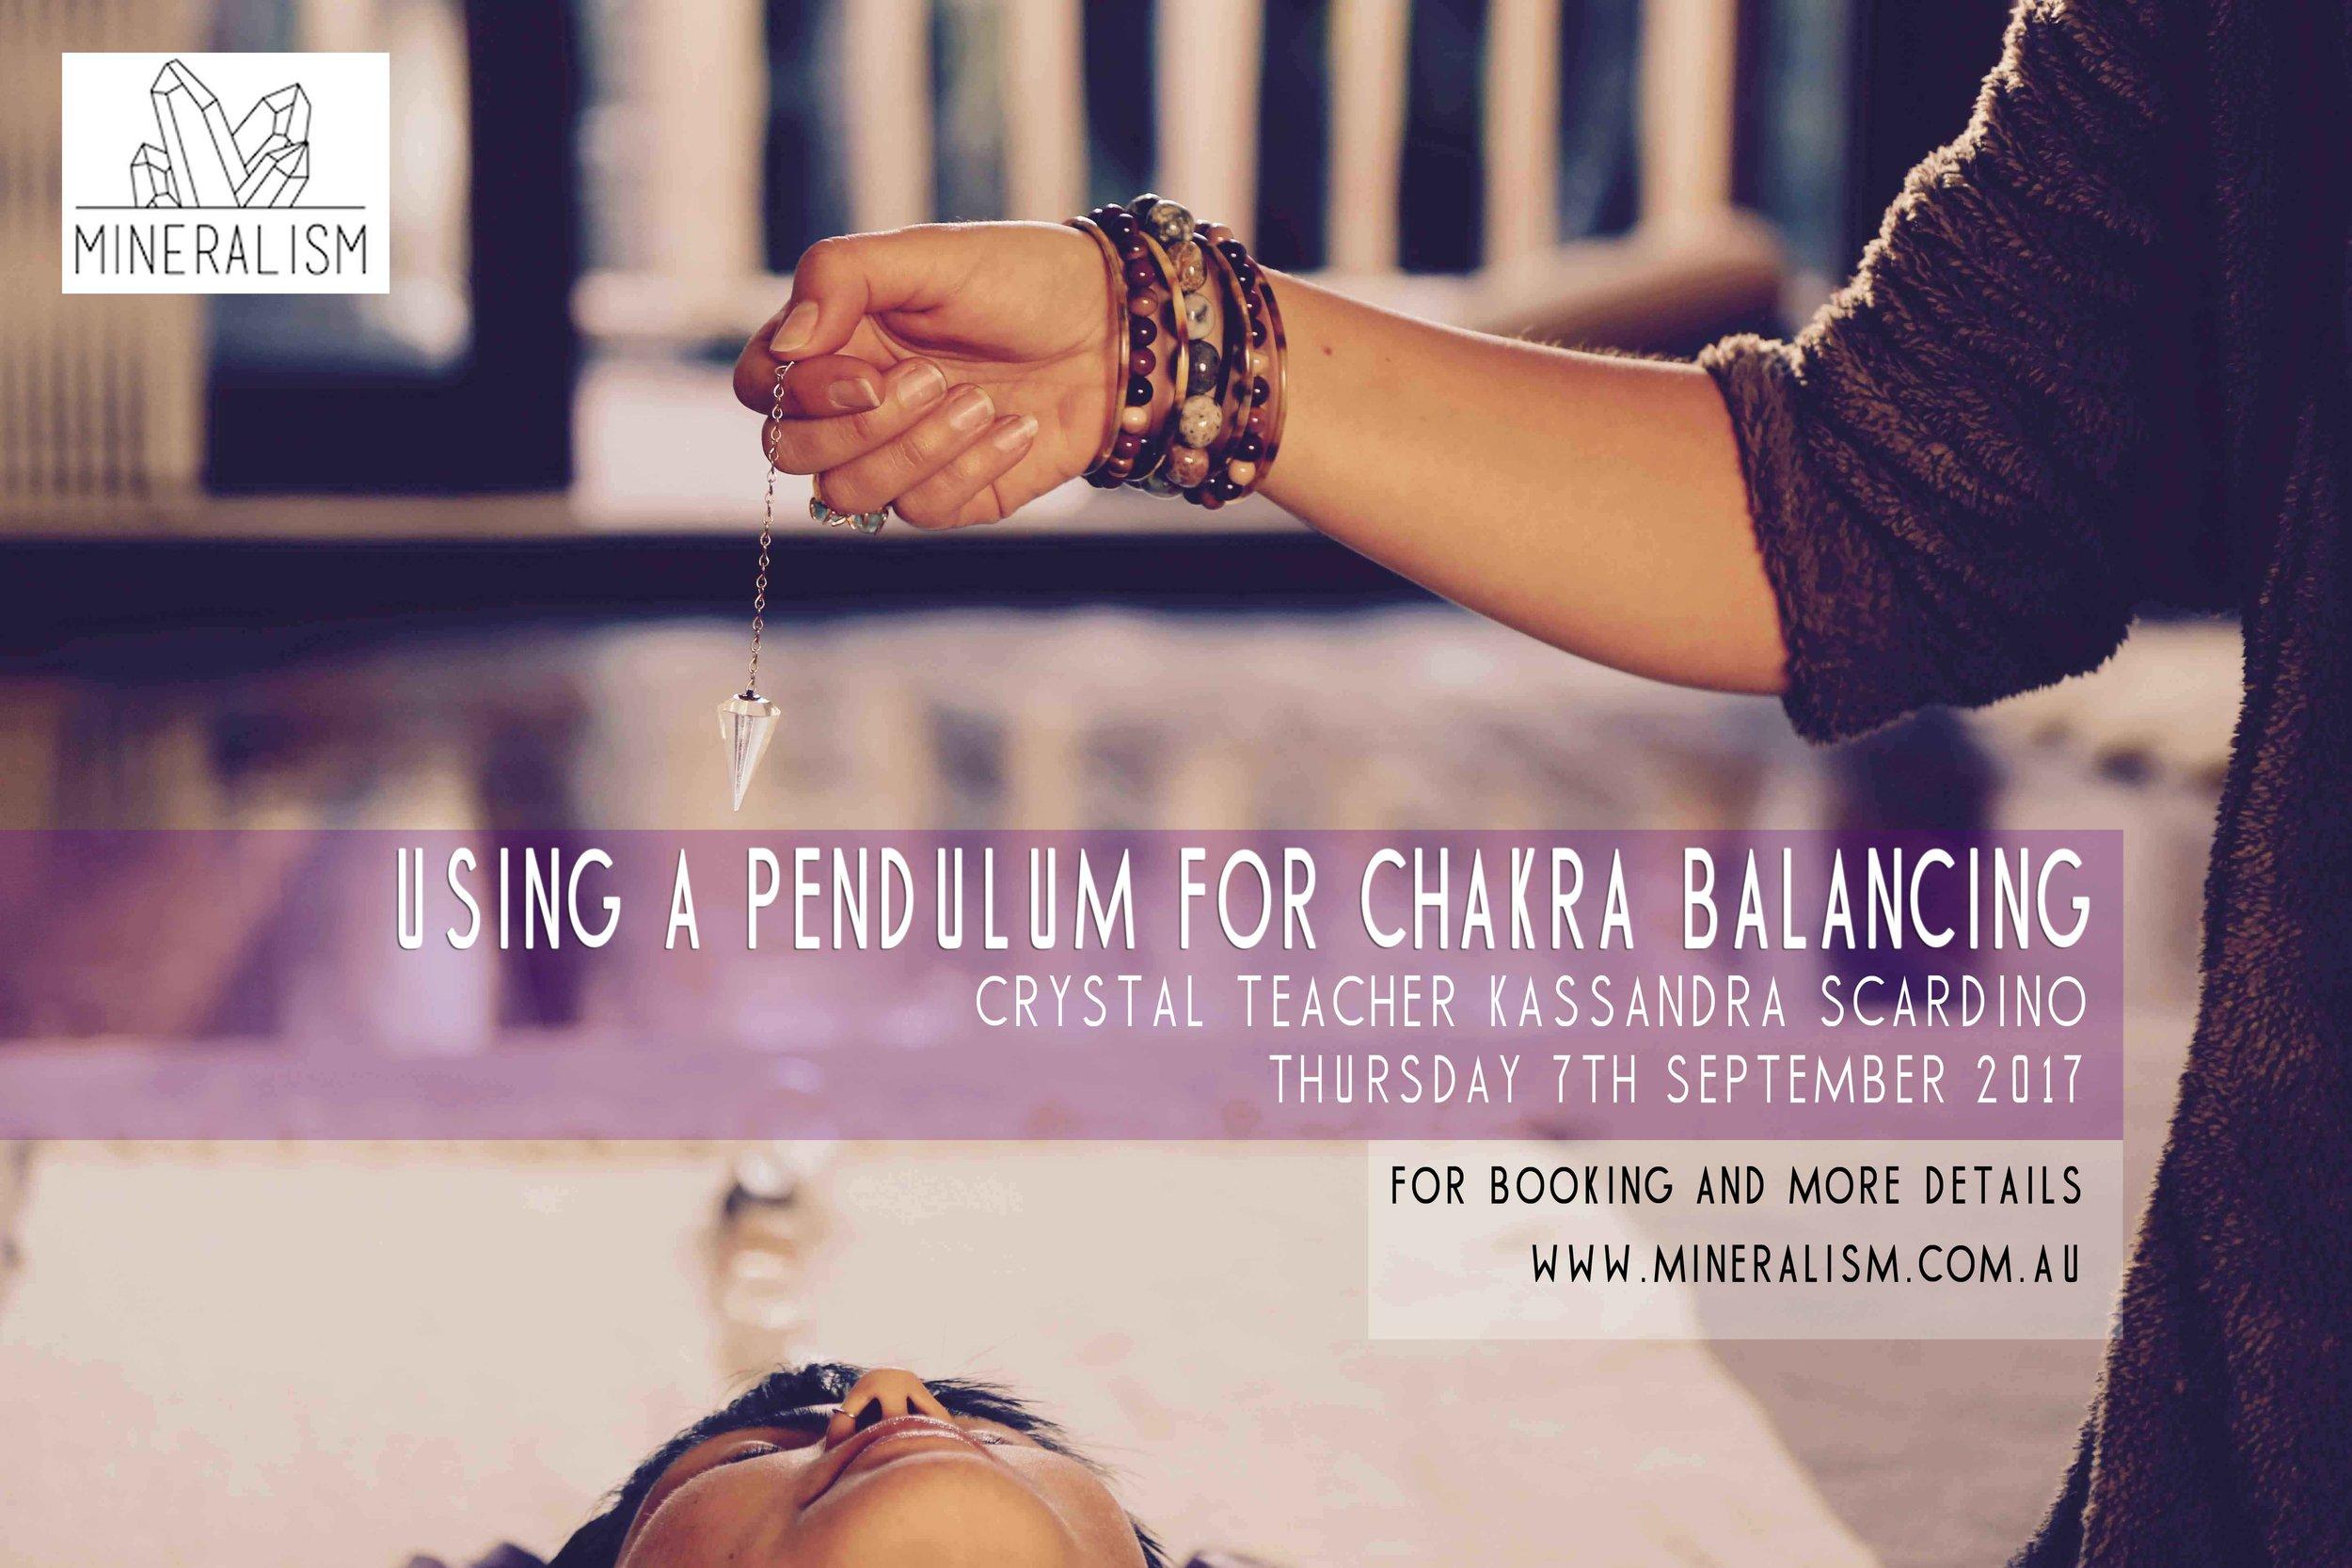 Using a Pendulum For Chakra Balancing at Mineralism, Glebe, Sydney.